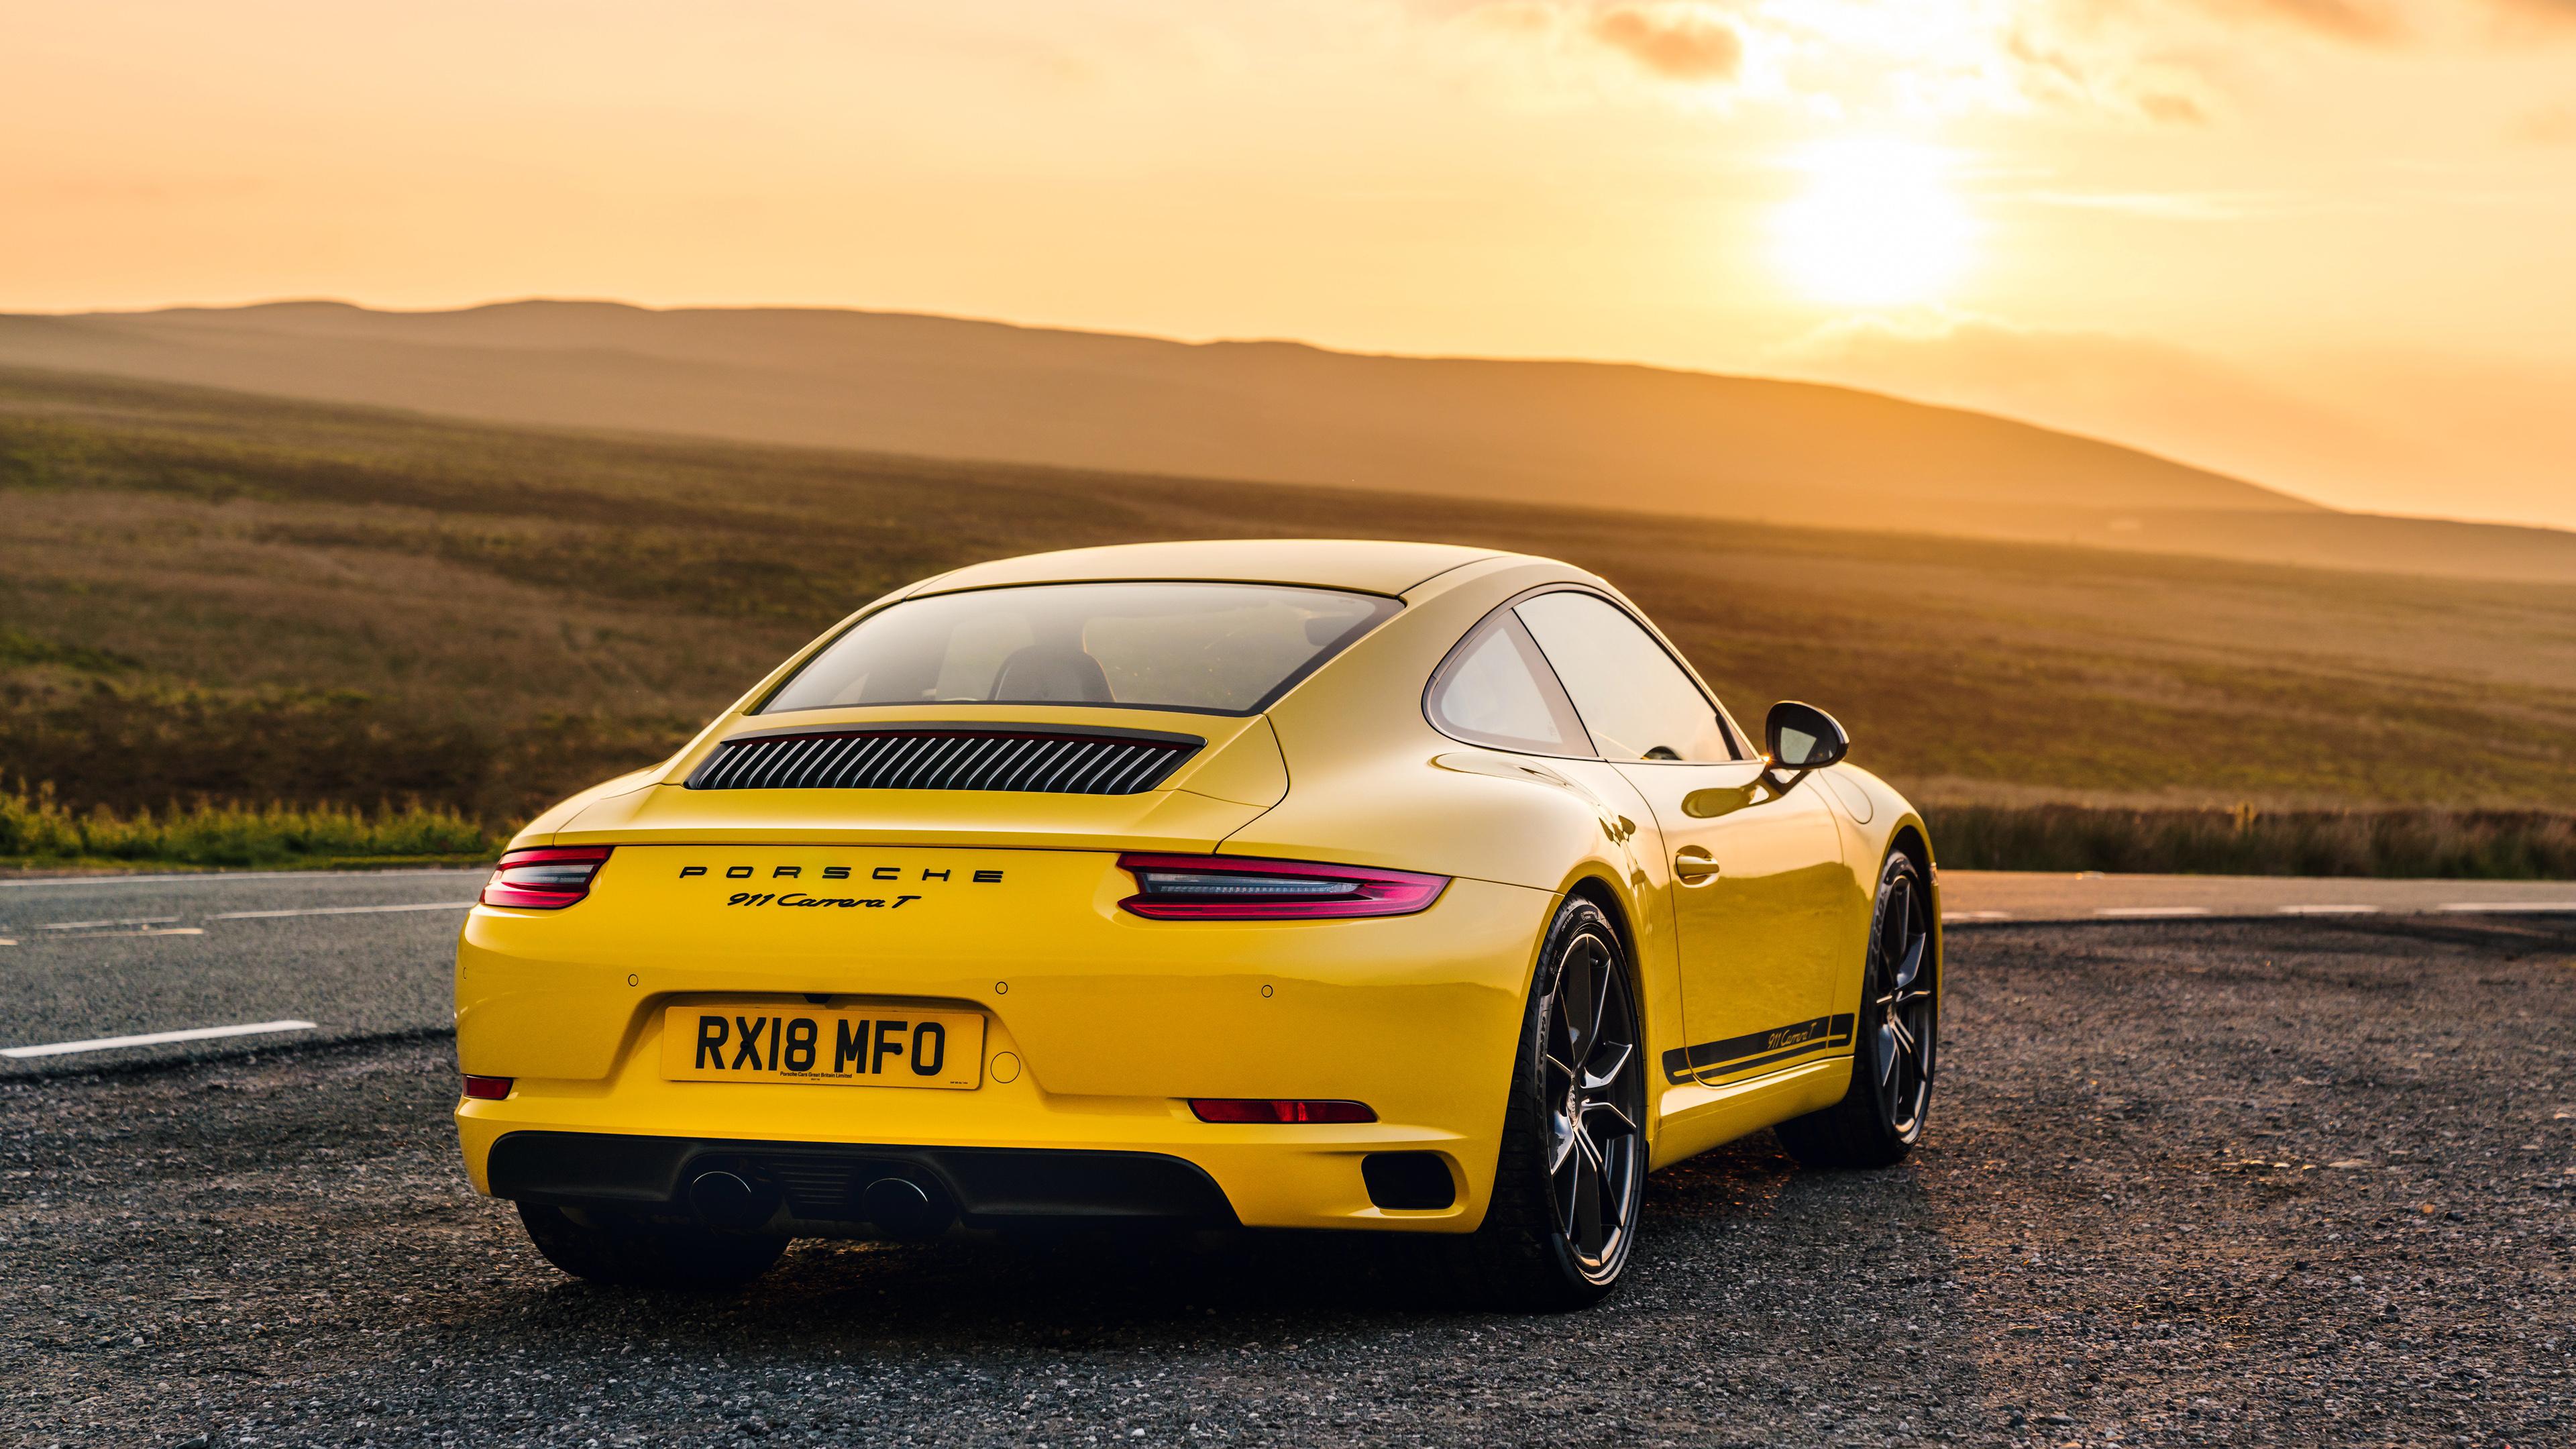 Porsche 911 Carrera T 4k Ultra Papel De Parede Hd Plano De Fundo 3840x2160 Id 940360 Wallpaper Abyss